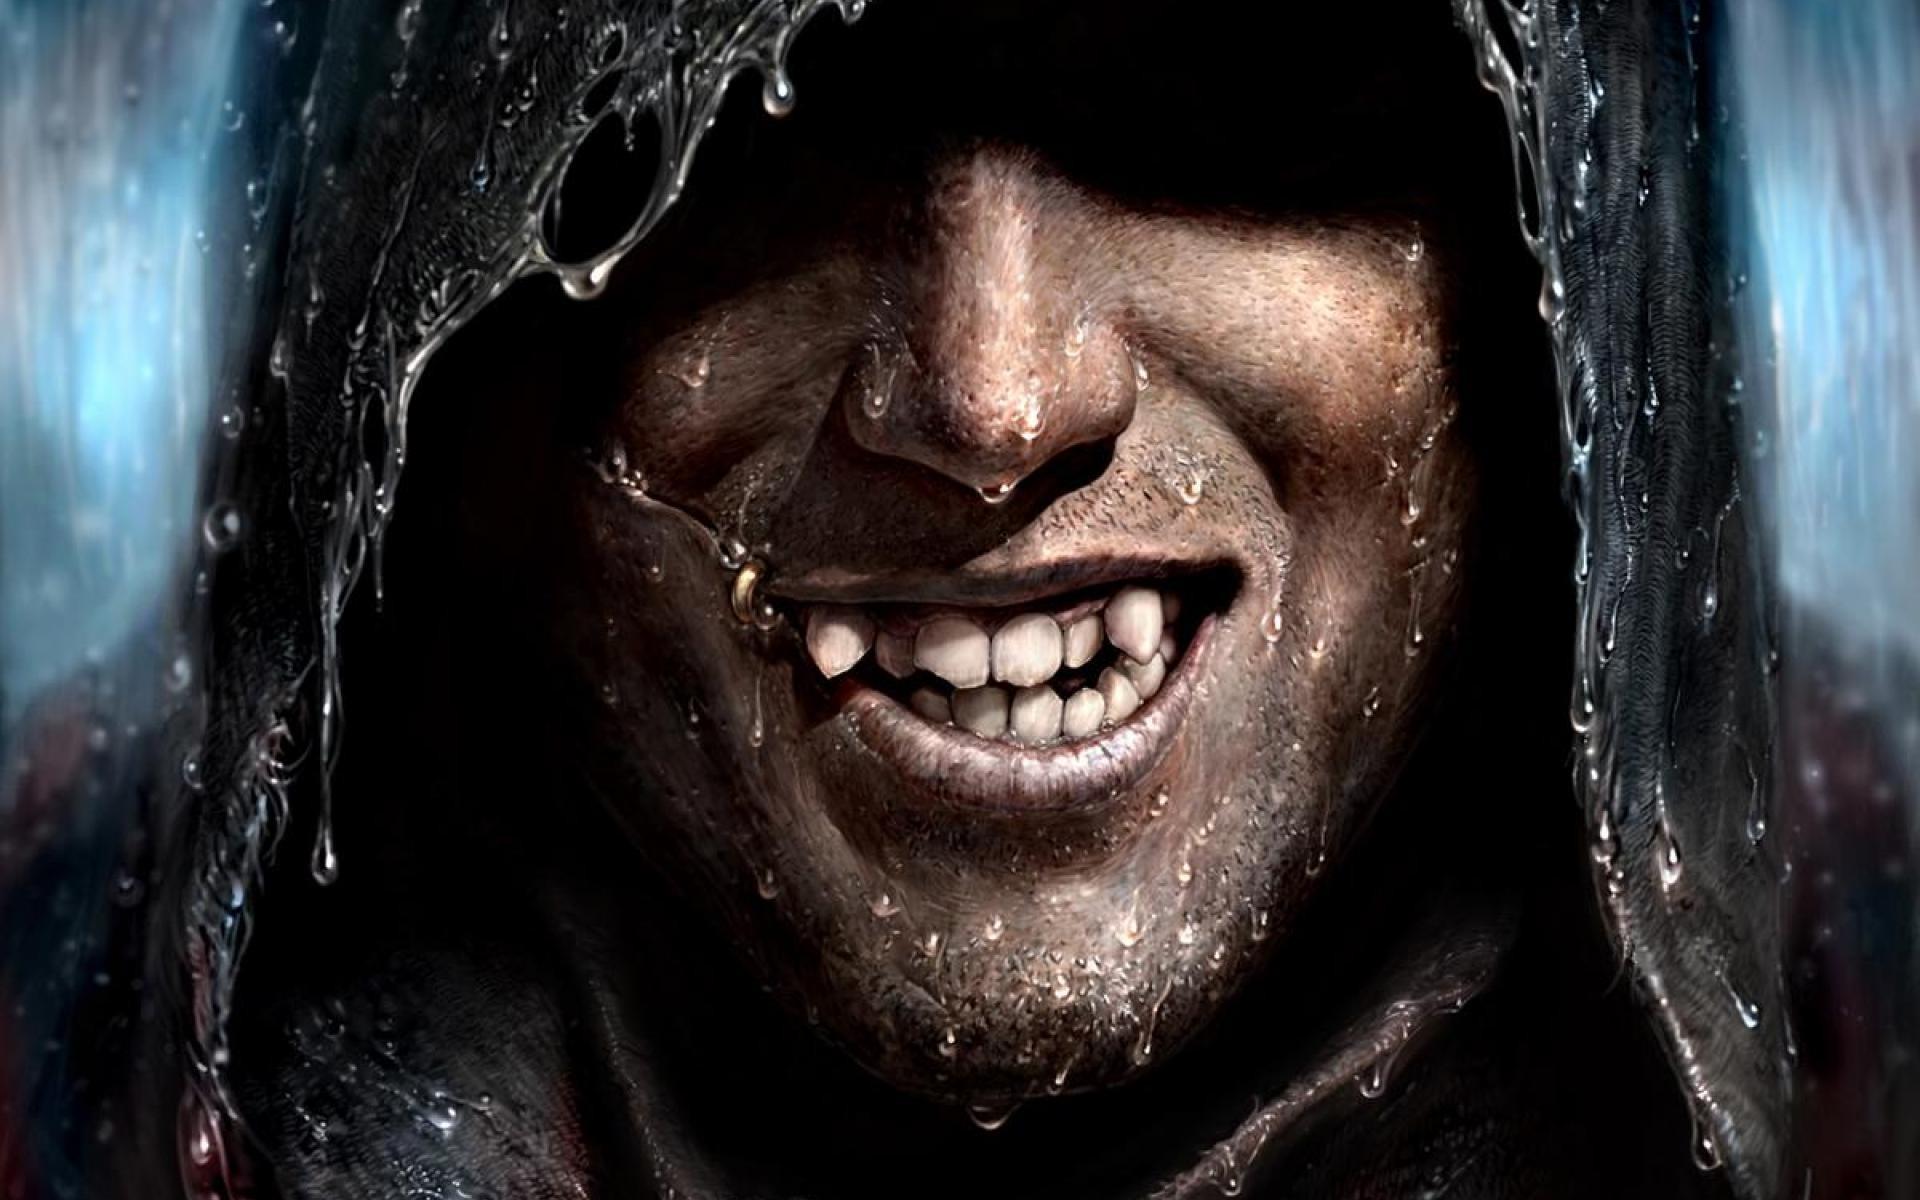 Res: 1920x1200, Vampire-man-spooky-rain-storm-creepy-canine-teeth-evil-smile-.jpg